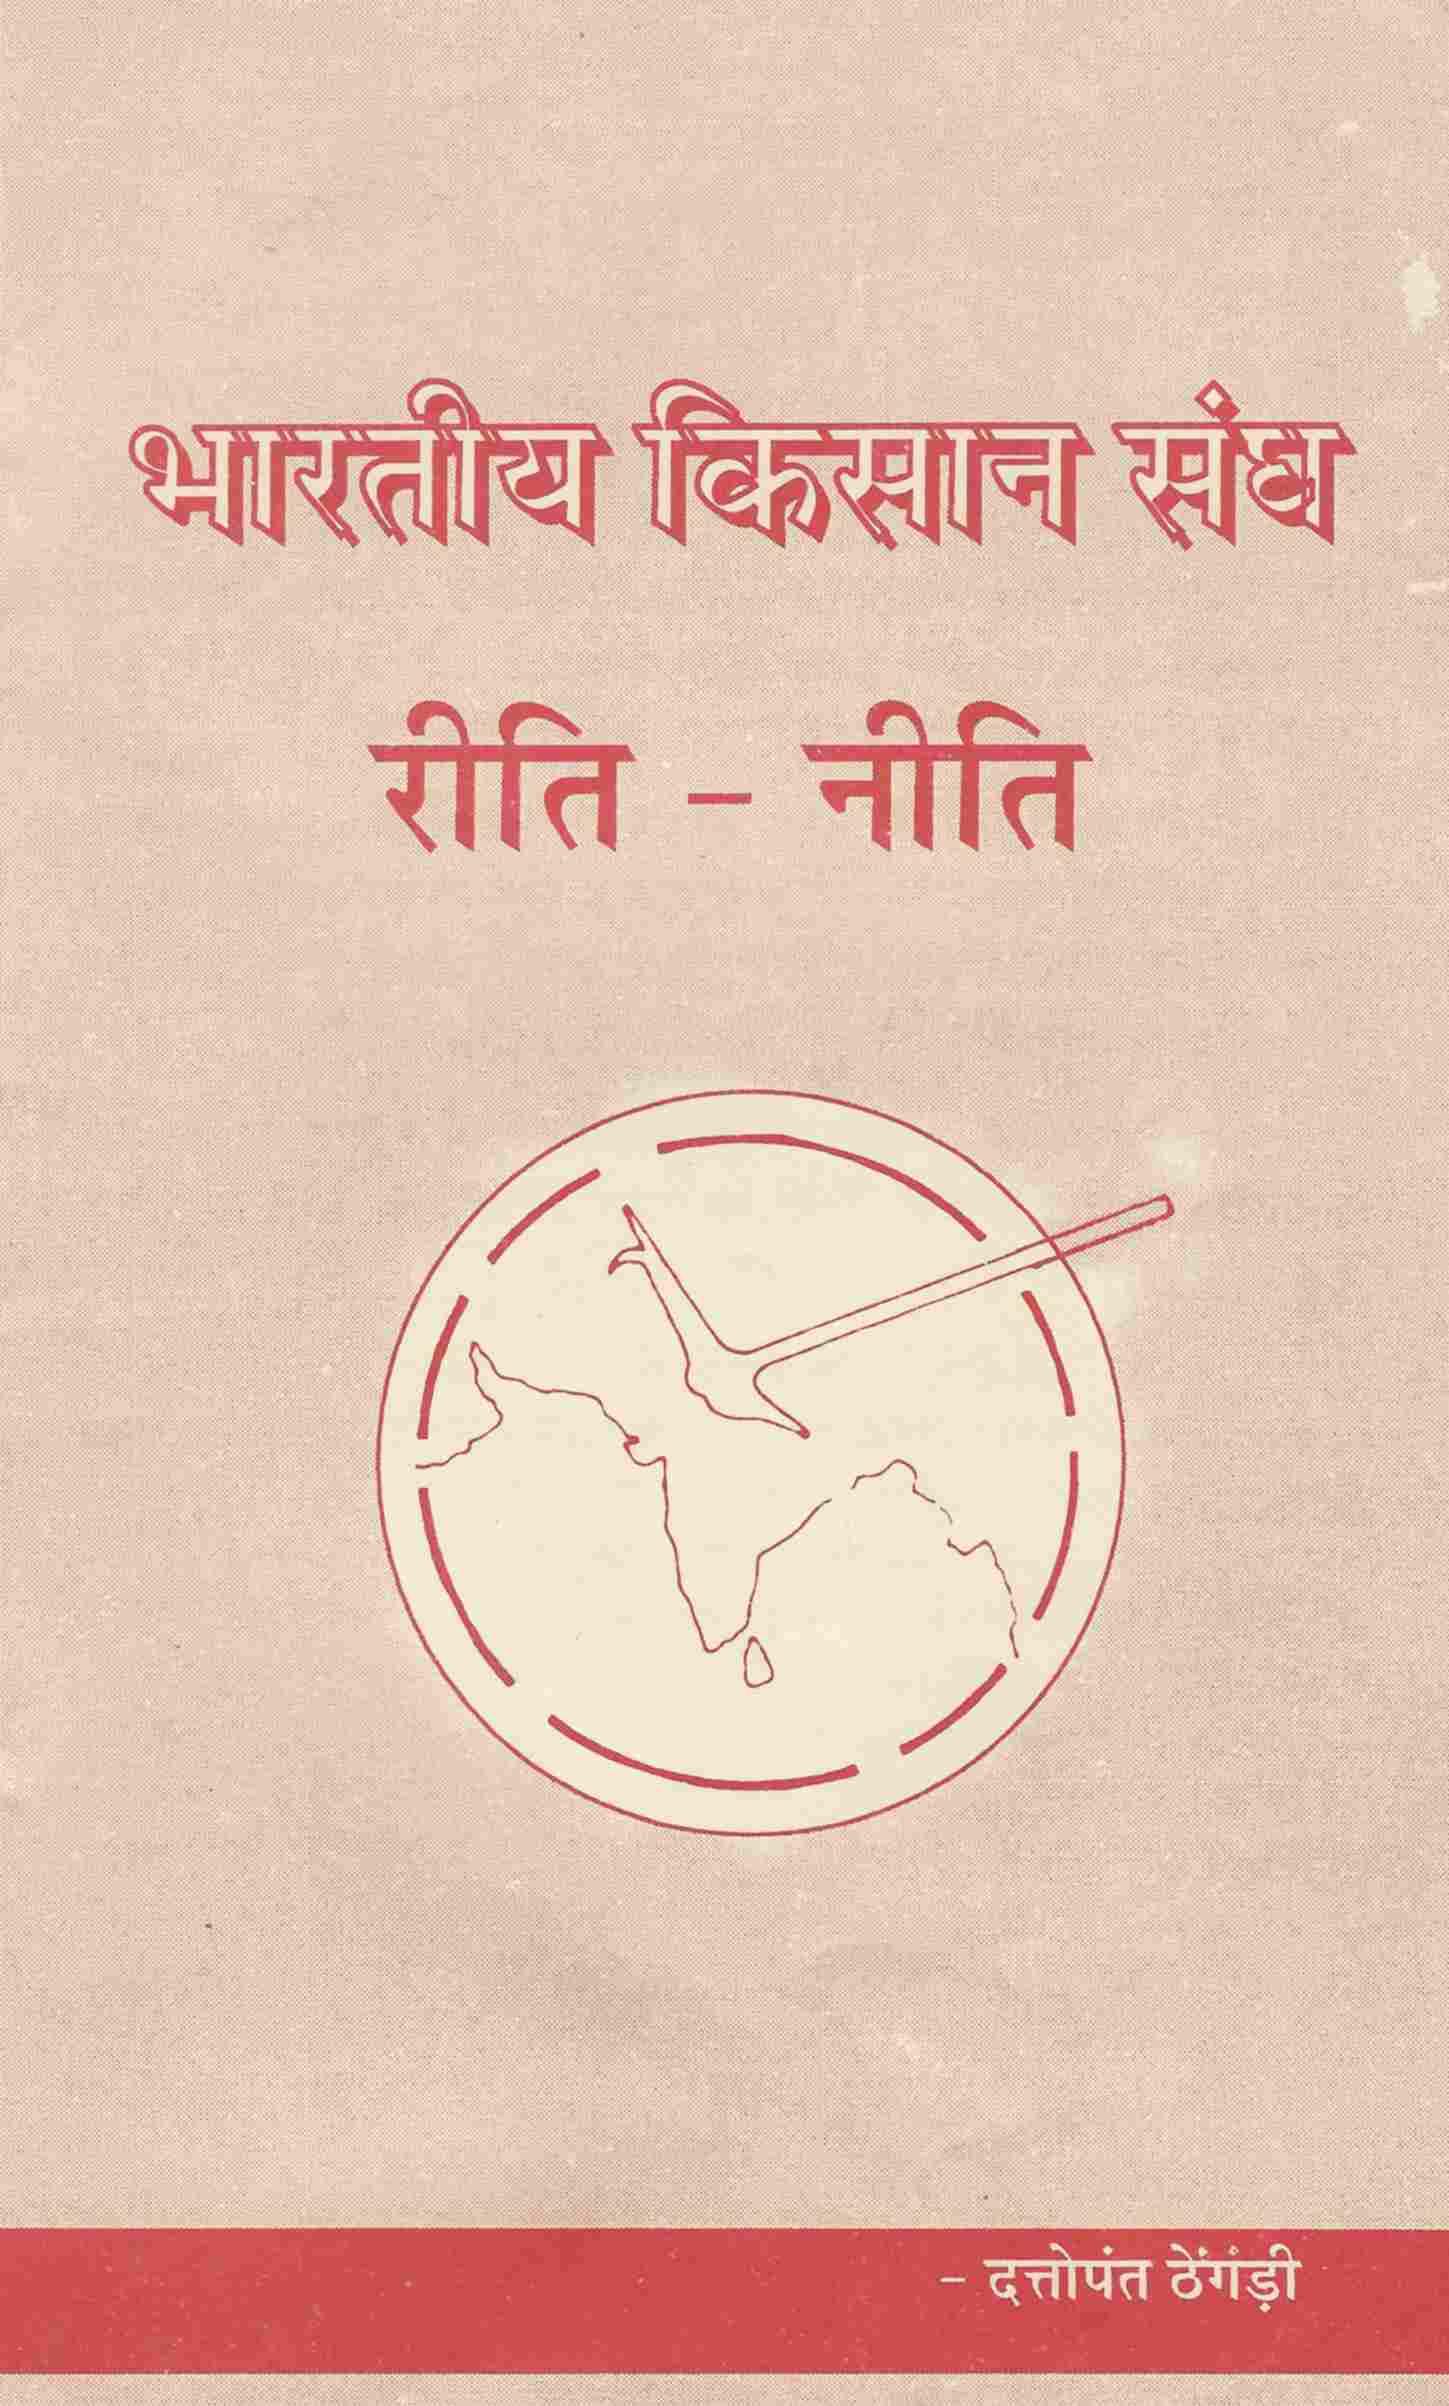 भारतीय किसान संघ-रीति नीति